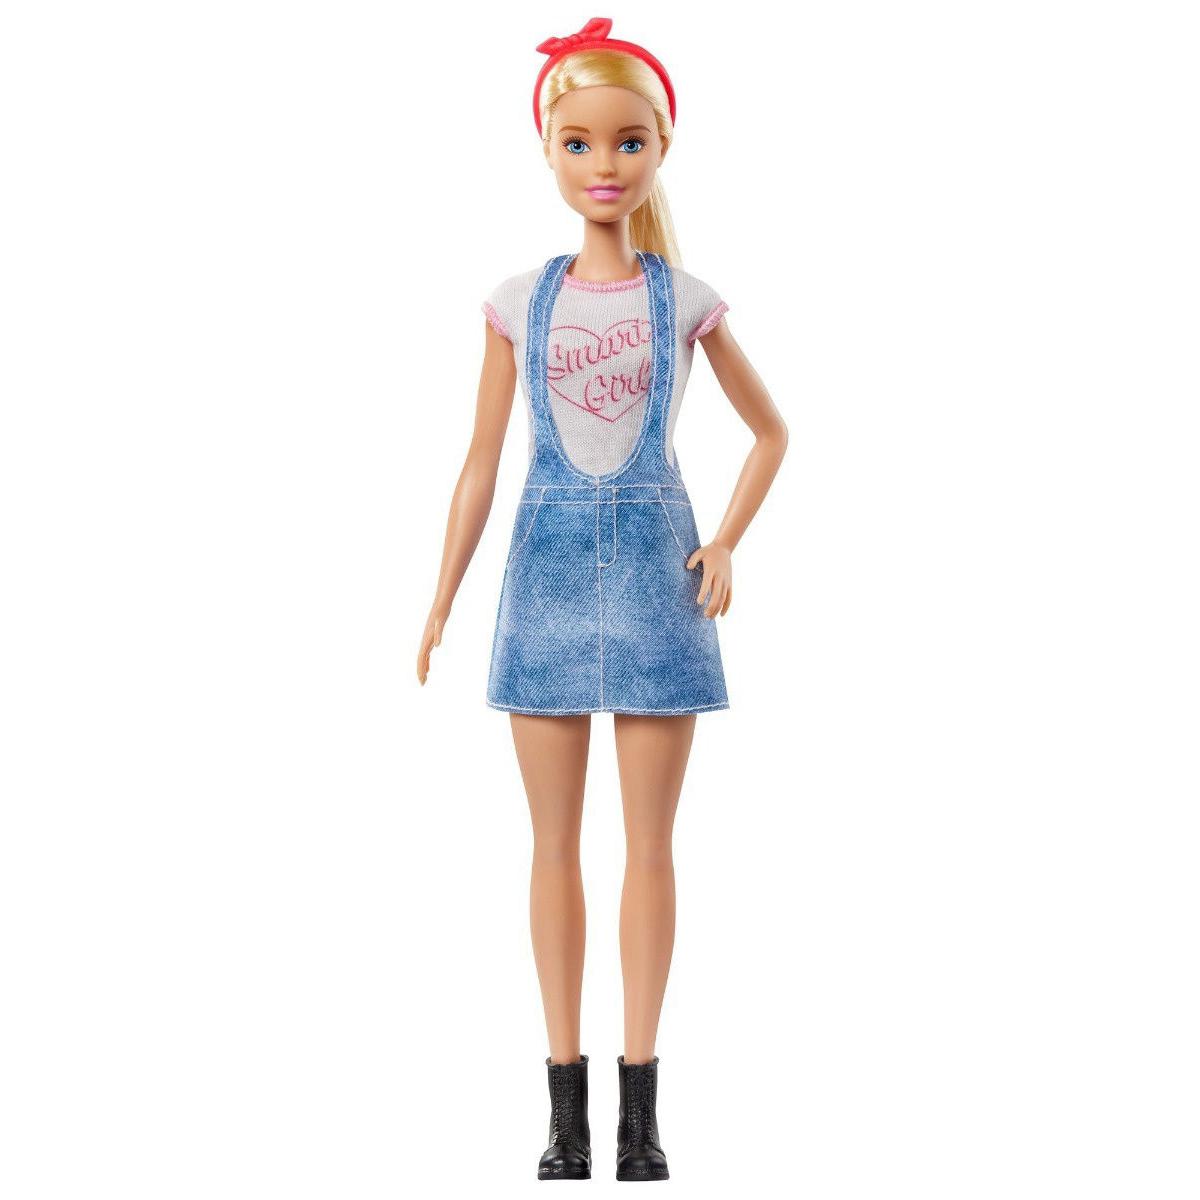 Кукла Mattel Barbie Загадочные профессии GLH62 barbie кукла медсестра dvf57